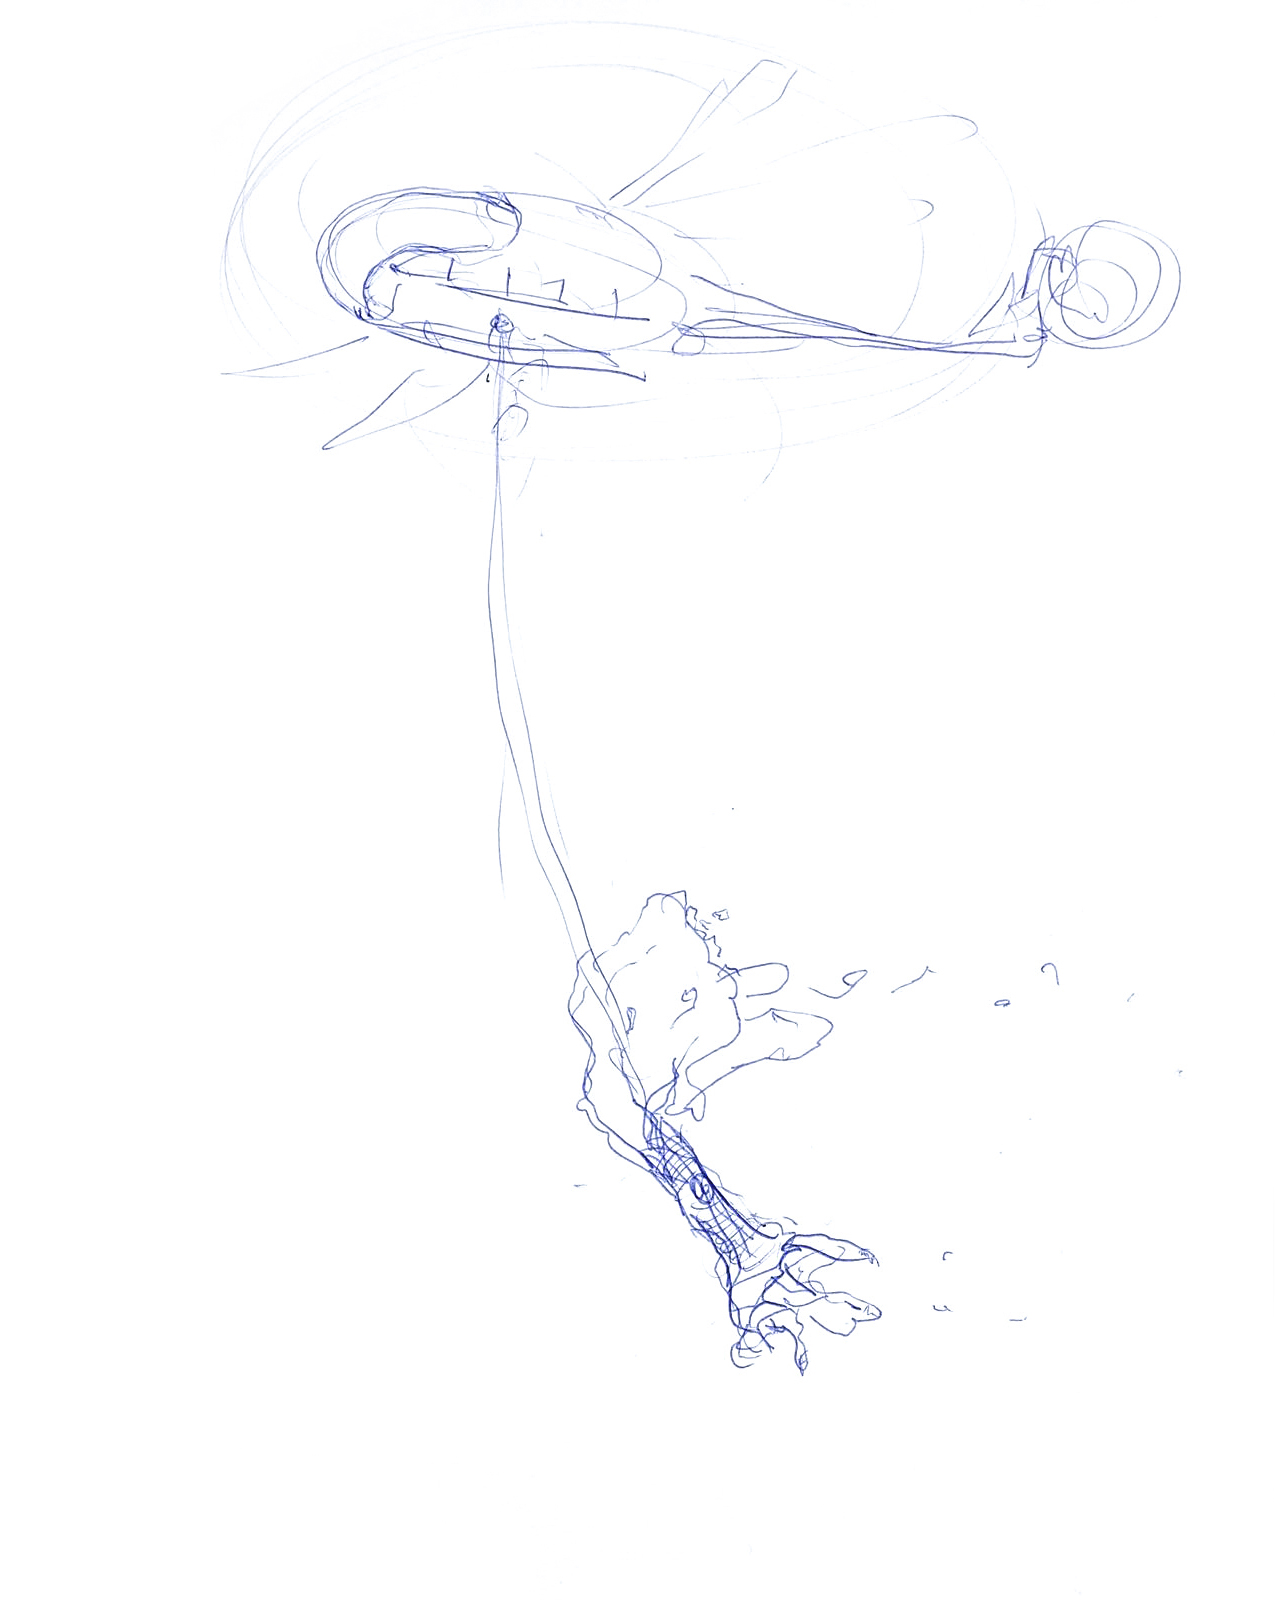 Jukai-Ryokō, idea sketch, ballpoint pen drawing on paper, 2020